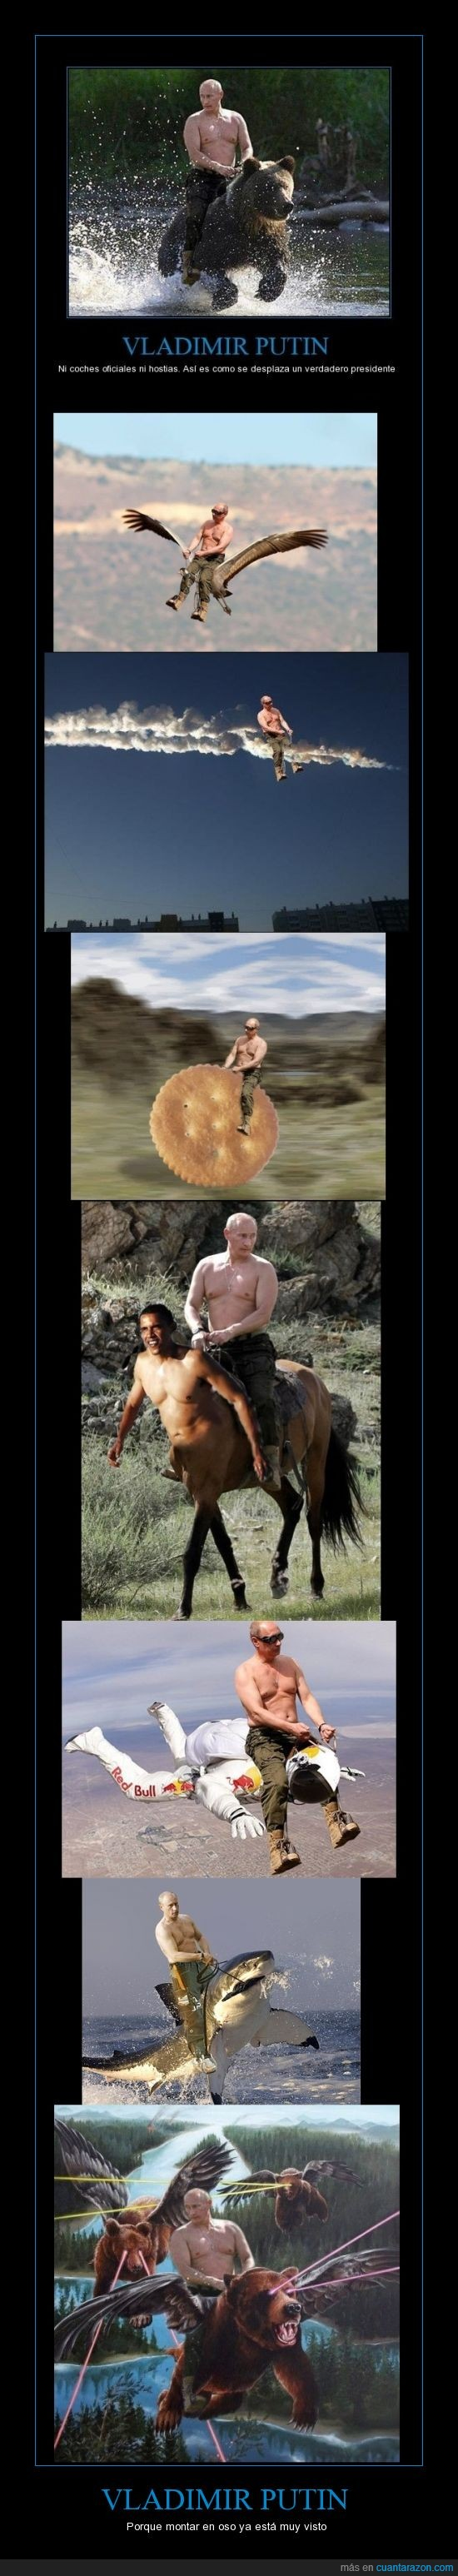 ; Presidentes,Centauros,chops,montajes,Osos,Putin,Rusos,Transporte,Vladimir Putin